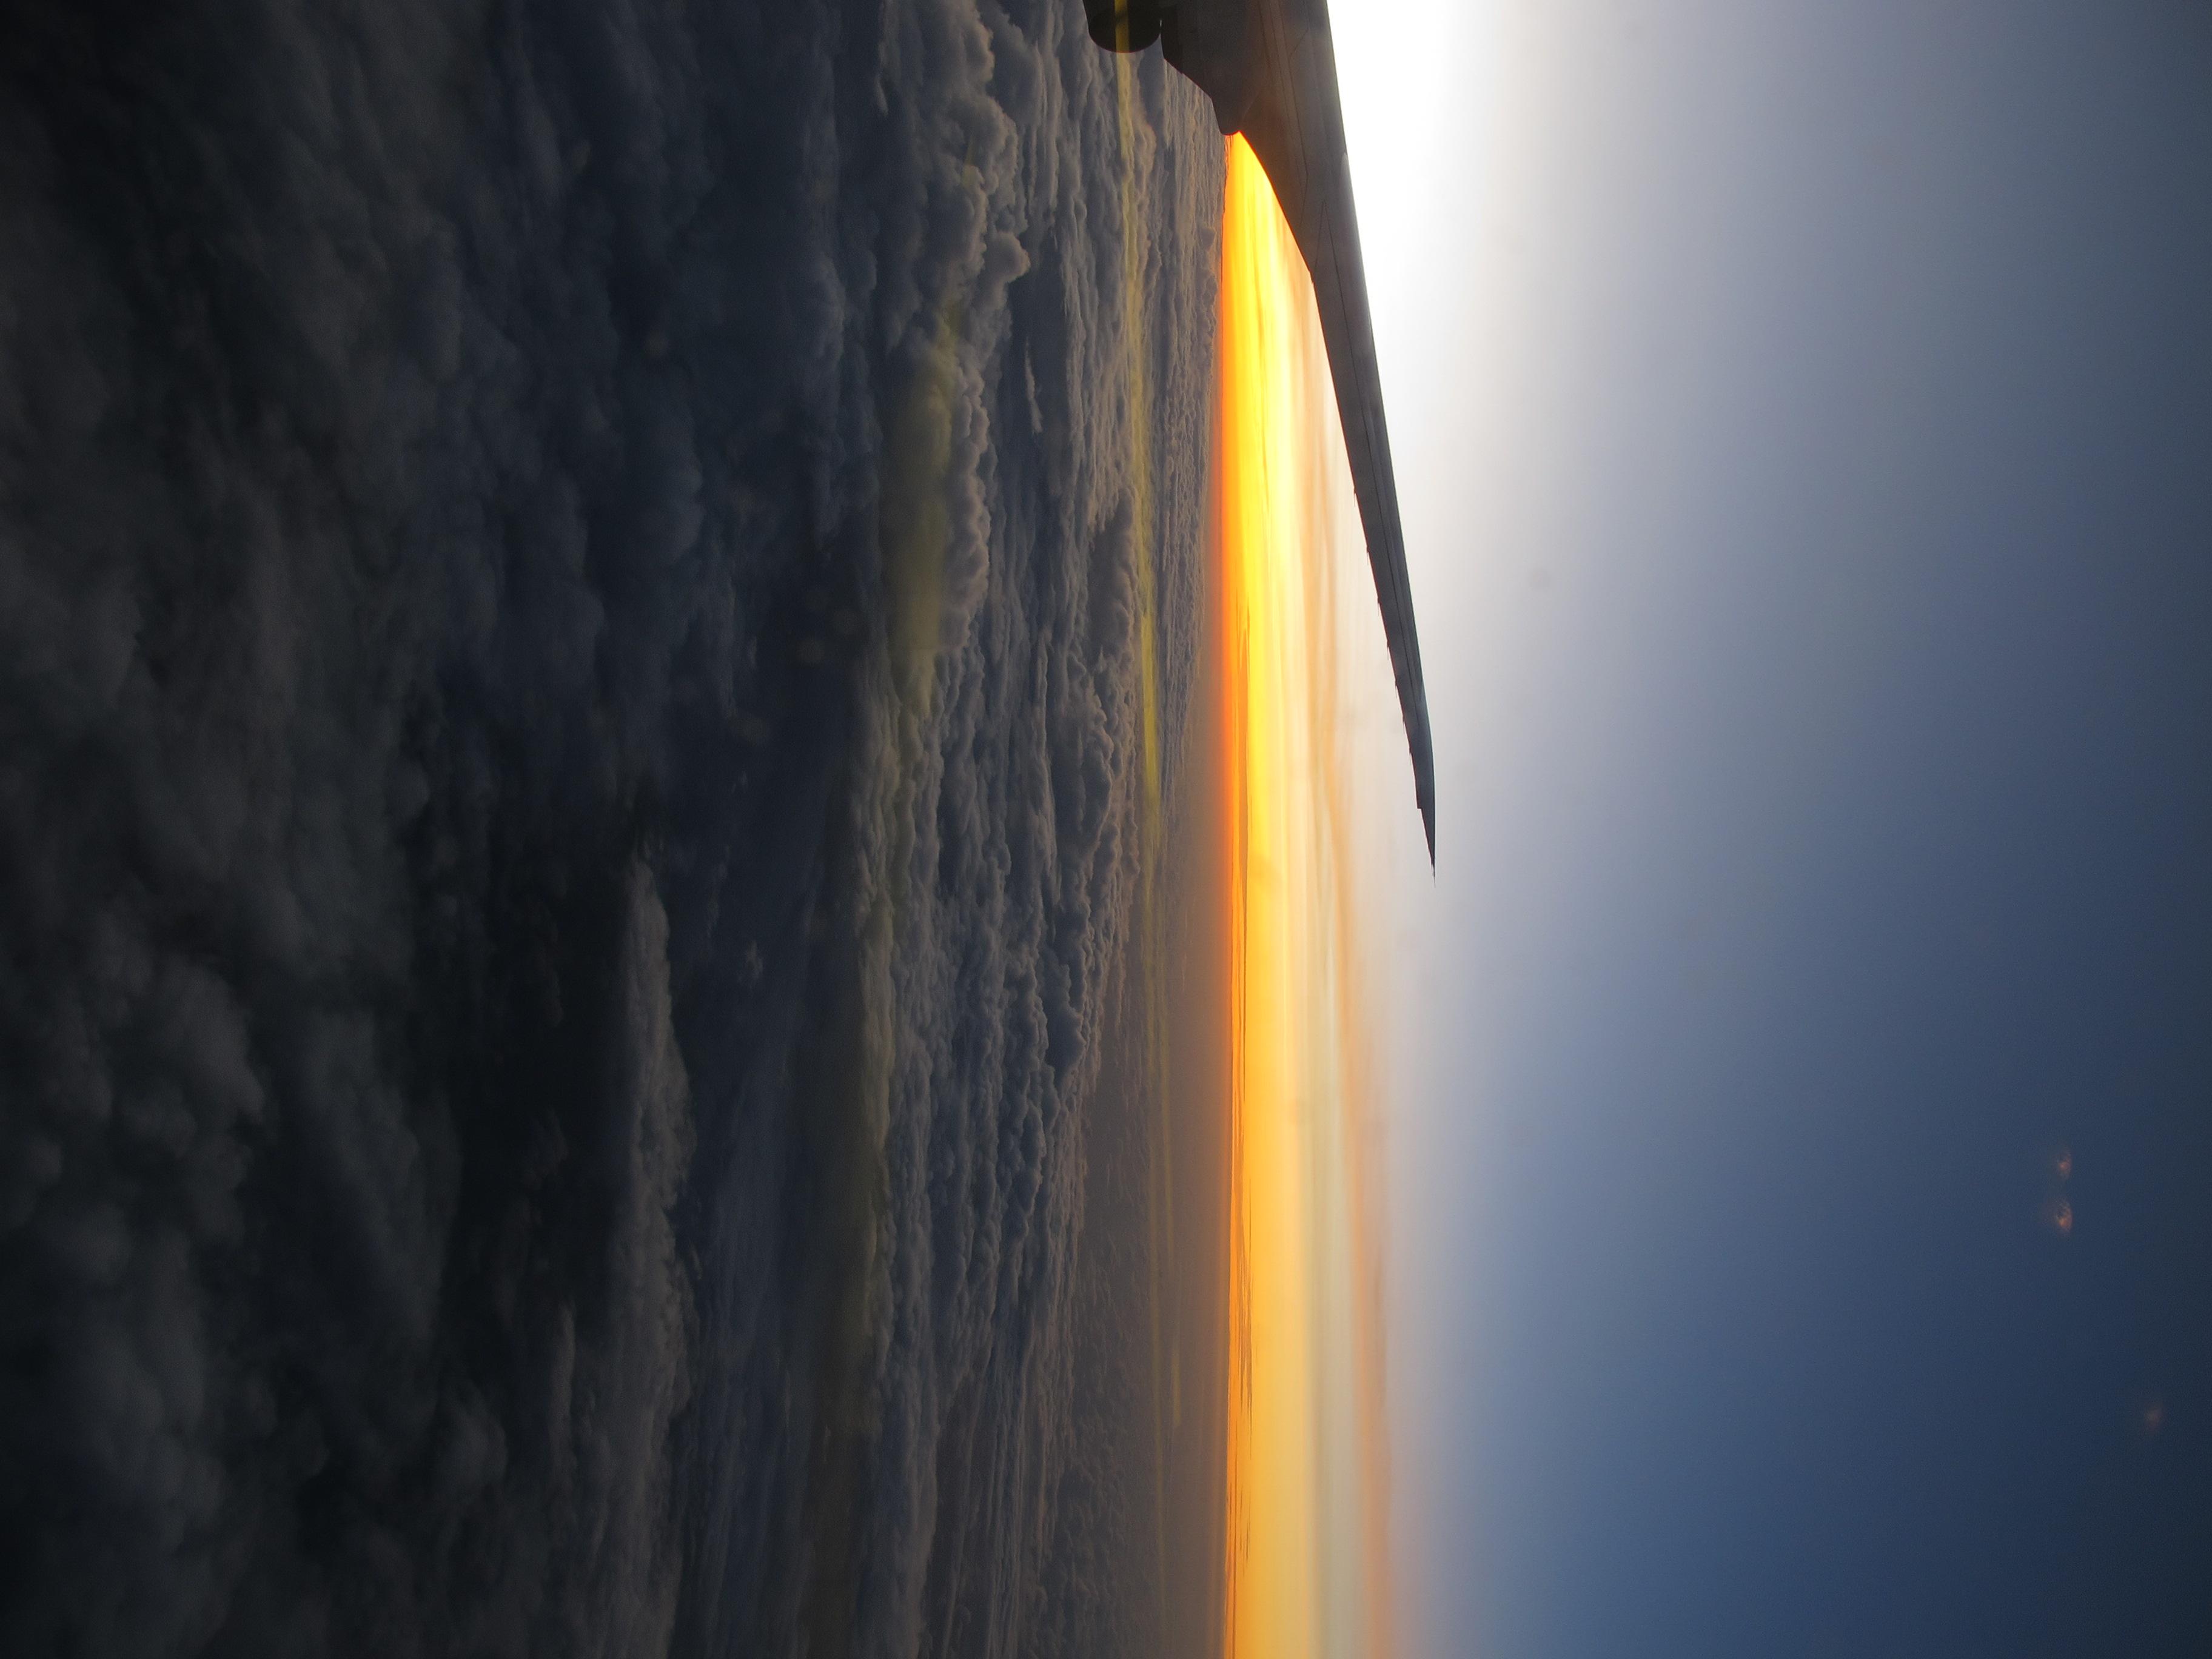 <b>機内から夕焼け空を撮影。シーンモードを夕焼けにセットし、空の赤さが強調された<br>PowerShot G11 / 2736x3648 / 1/60秒 / F3.2 / 0EV / ISO80 / WB:夕焼け /WB:オート / 6mm</b>